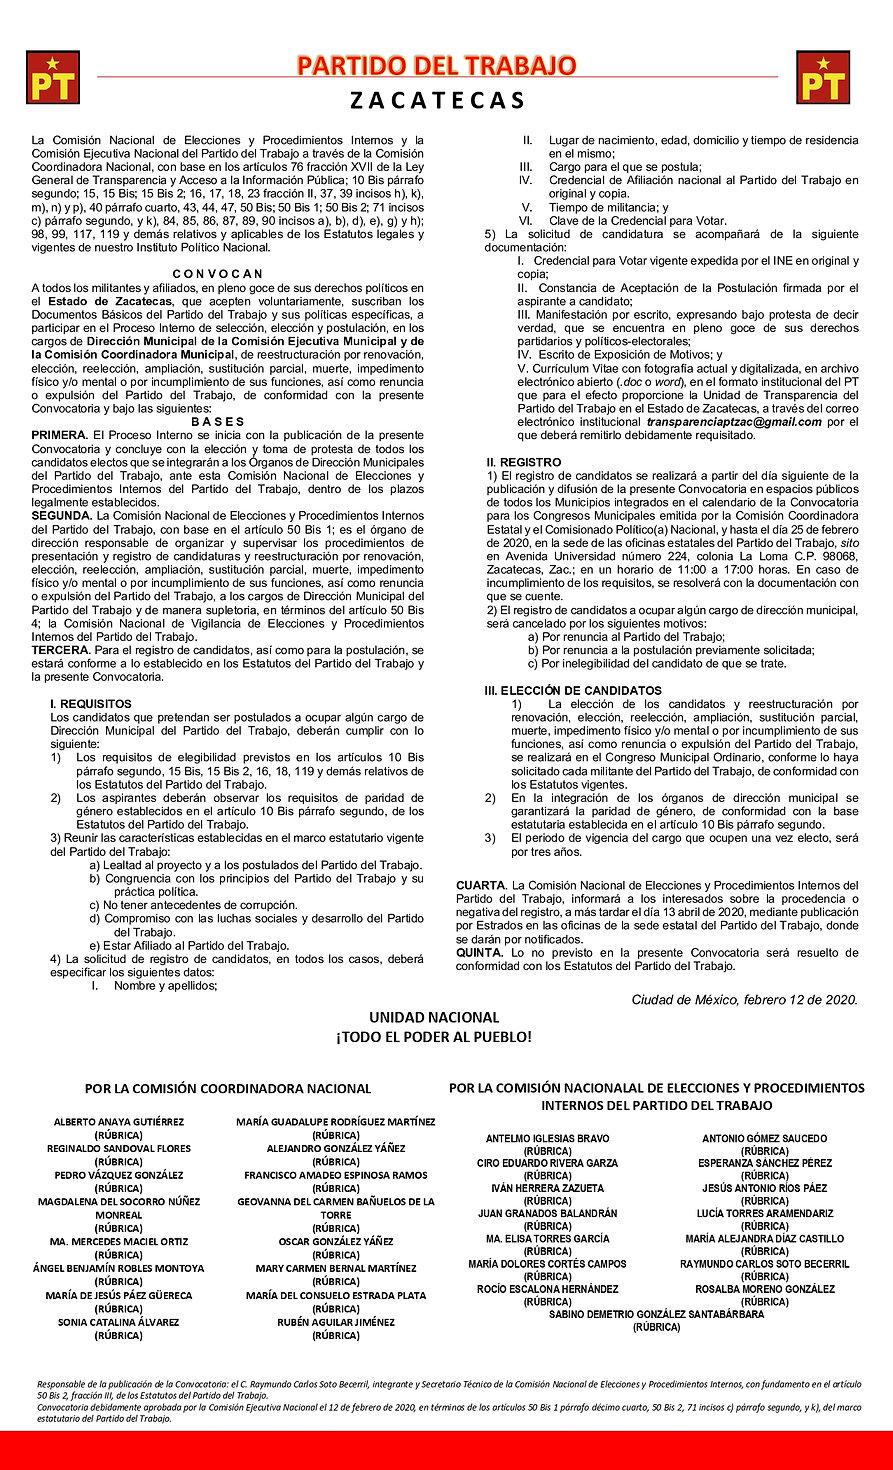 Convocatoria PT 2020_page-0002.jpg